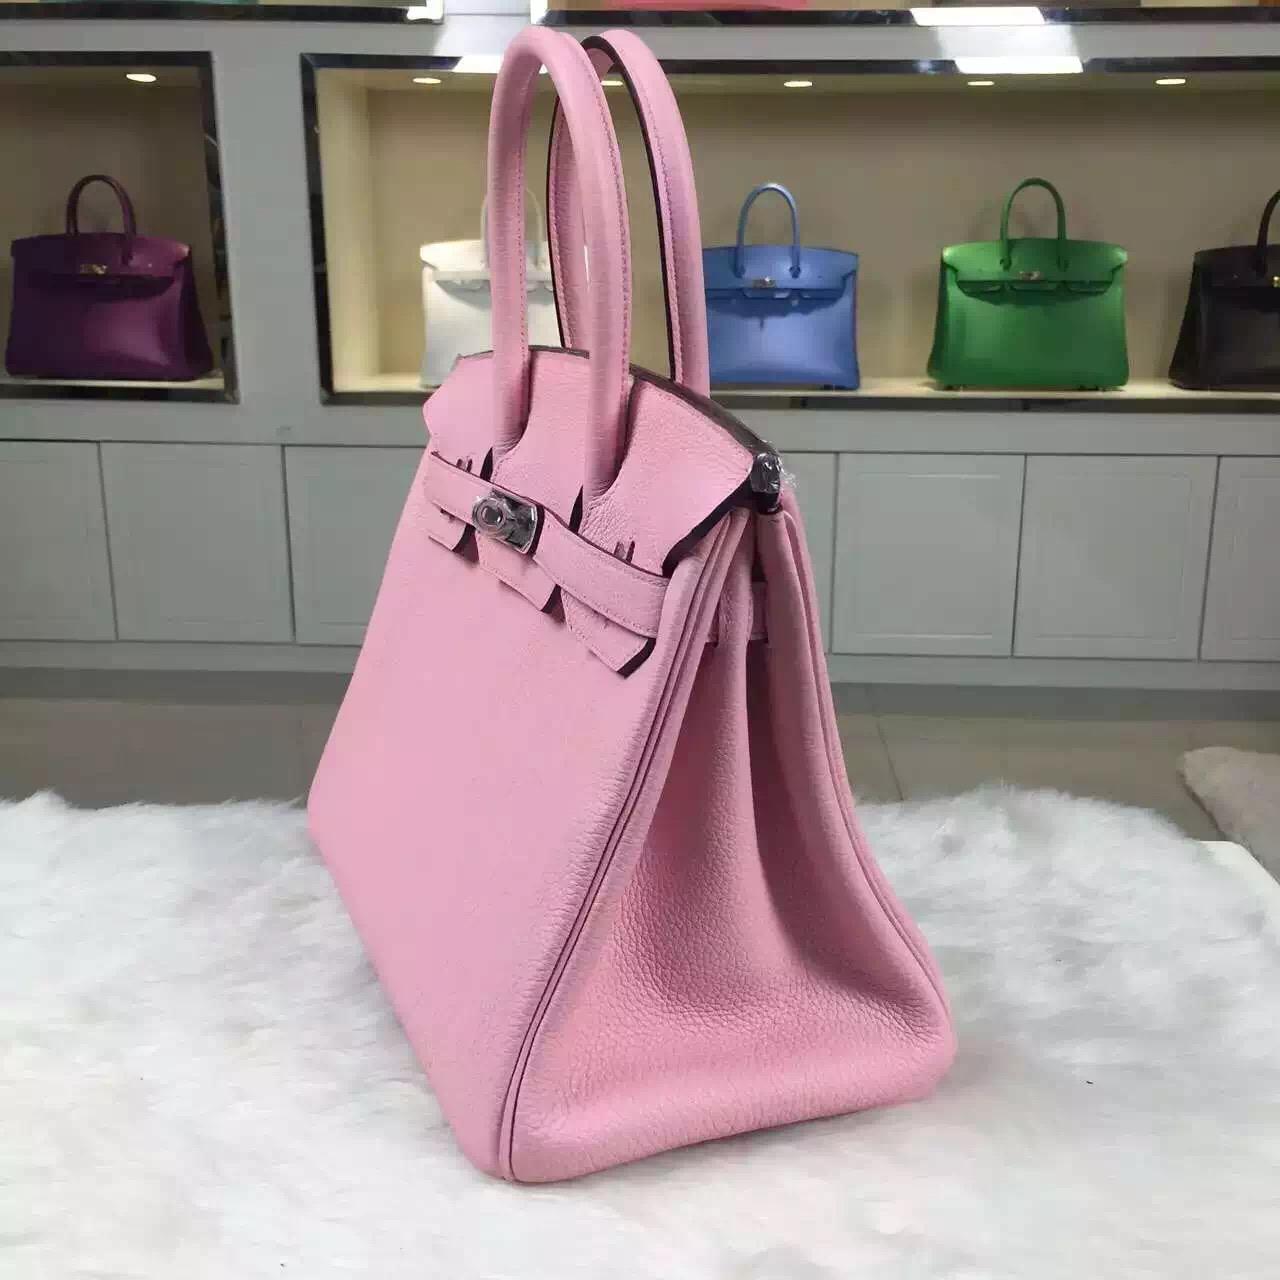 New Pretty Hermes Vip Customized 3Q Rose Sakura Togo Leather Birkin Handbag 30CM